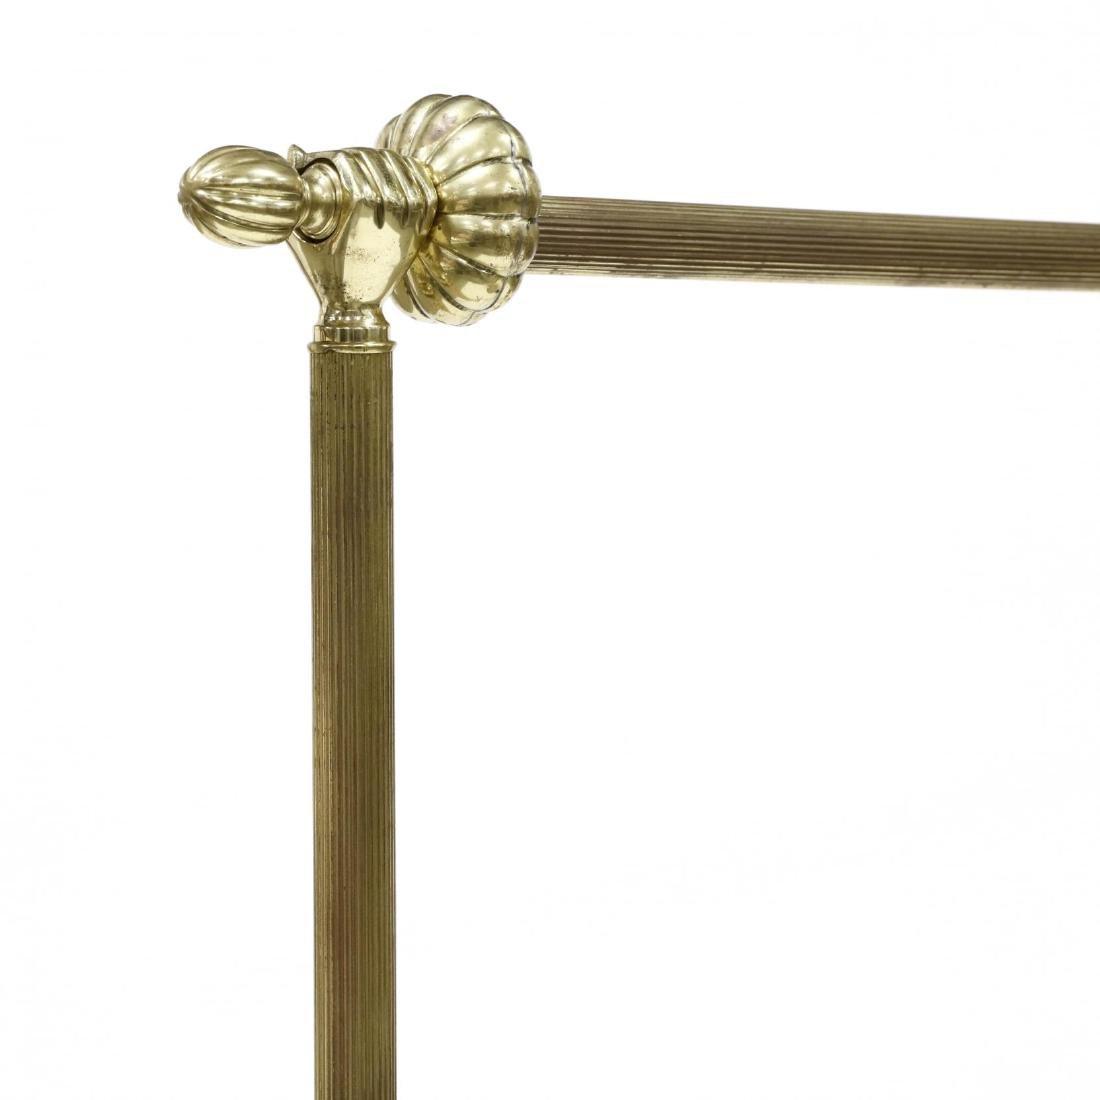 Vintage Brass Clothing Rack - 3